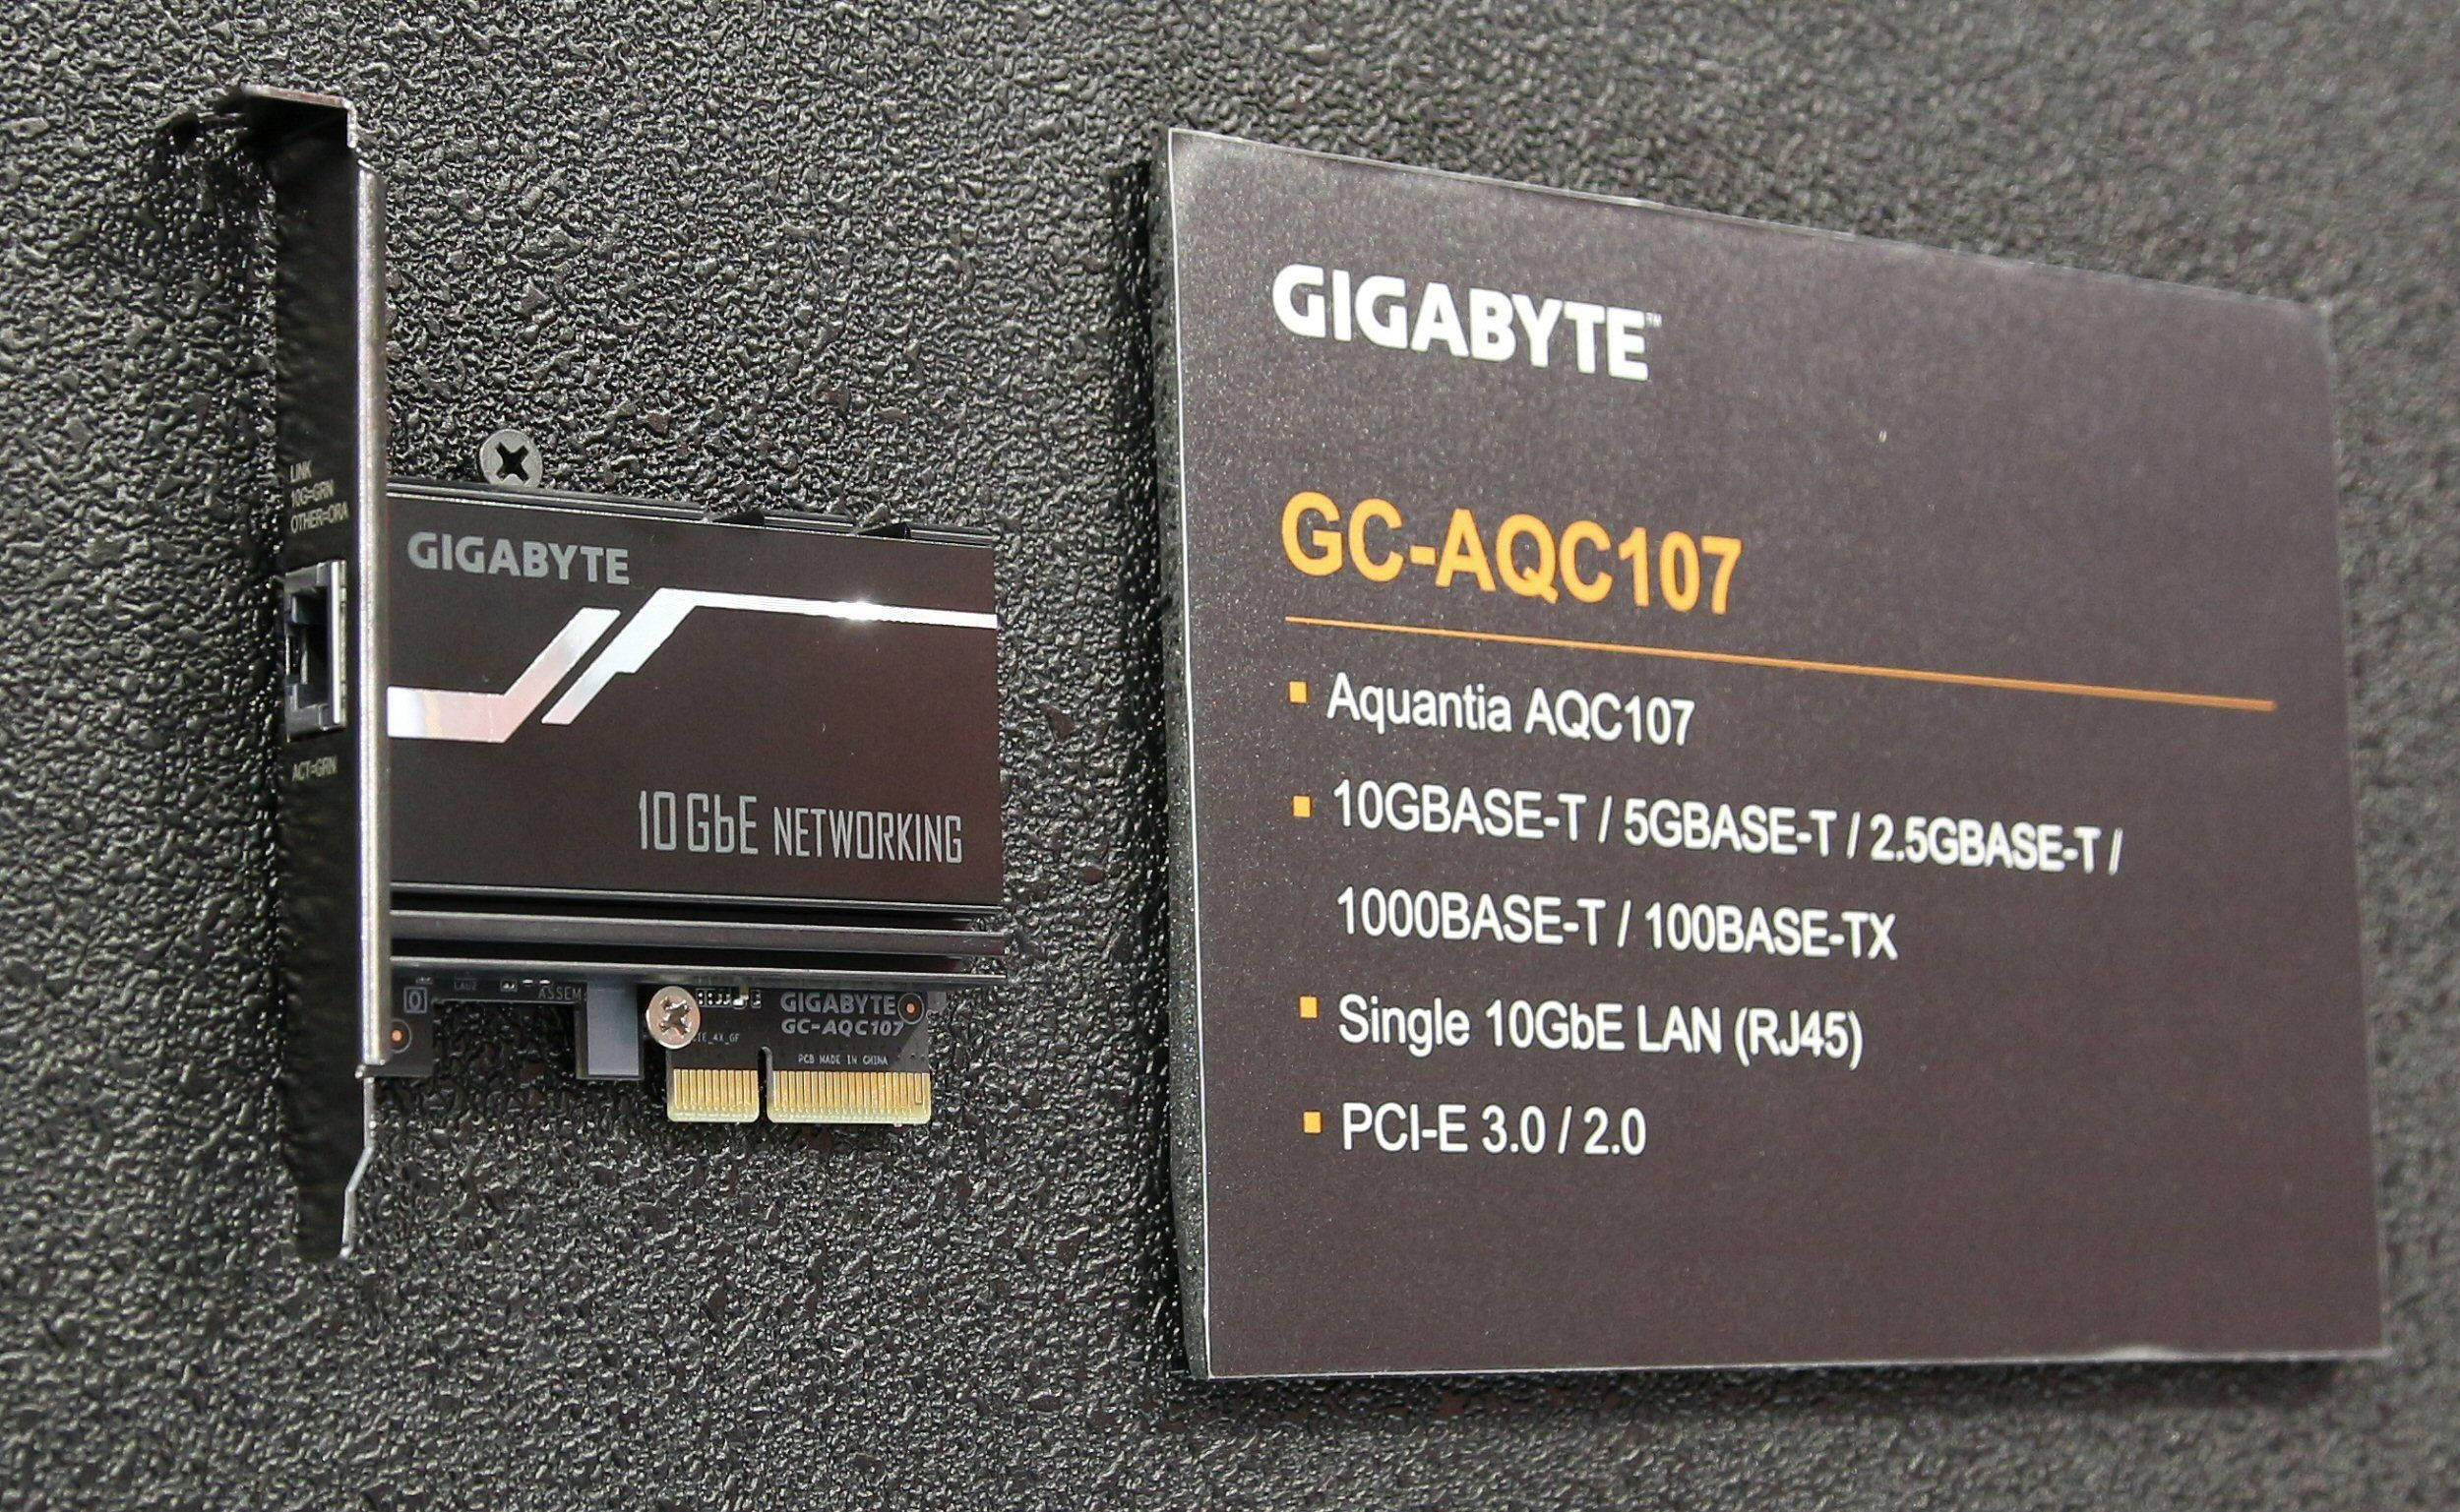 Gigabyte GC-AQC107.